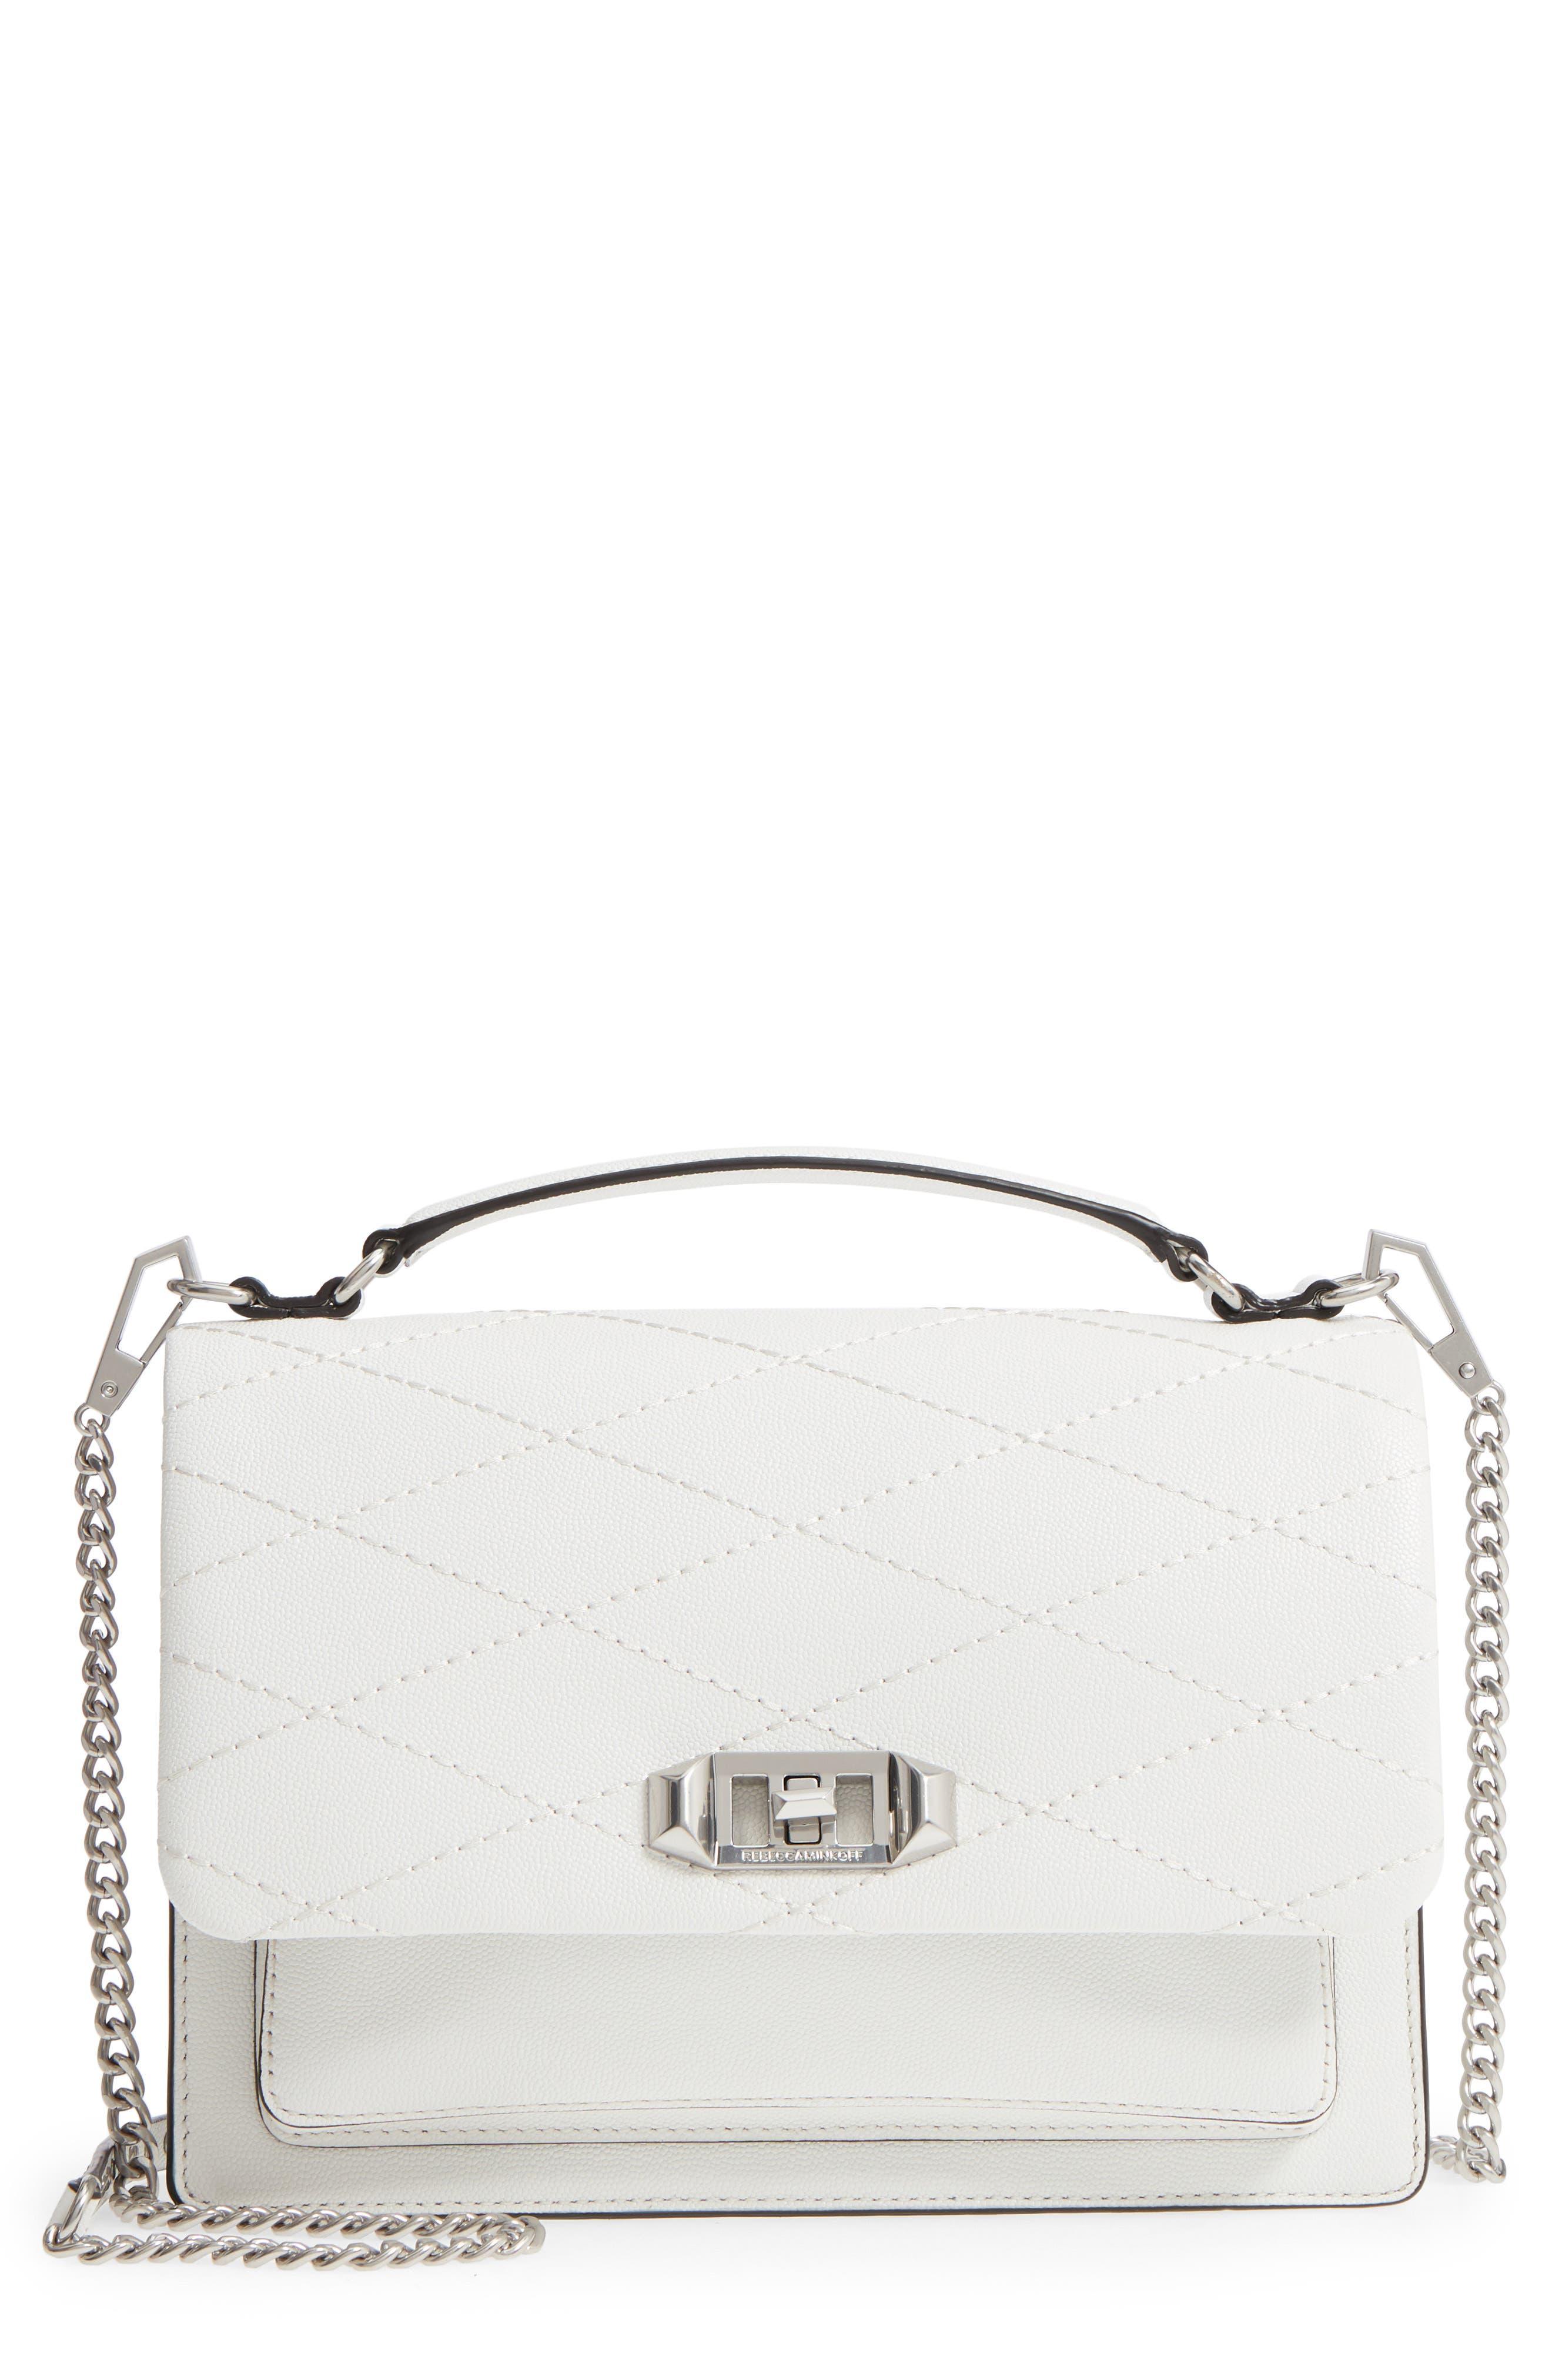 Rebecca Minkoff Medium Je T'aime Convertible Leather Crossbody Bag